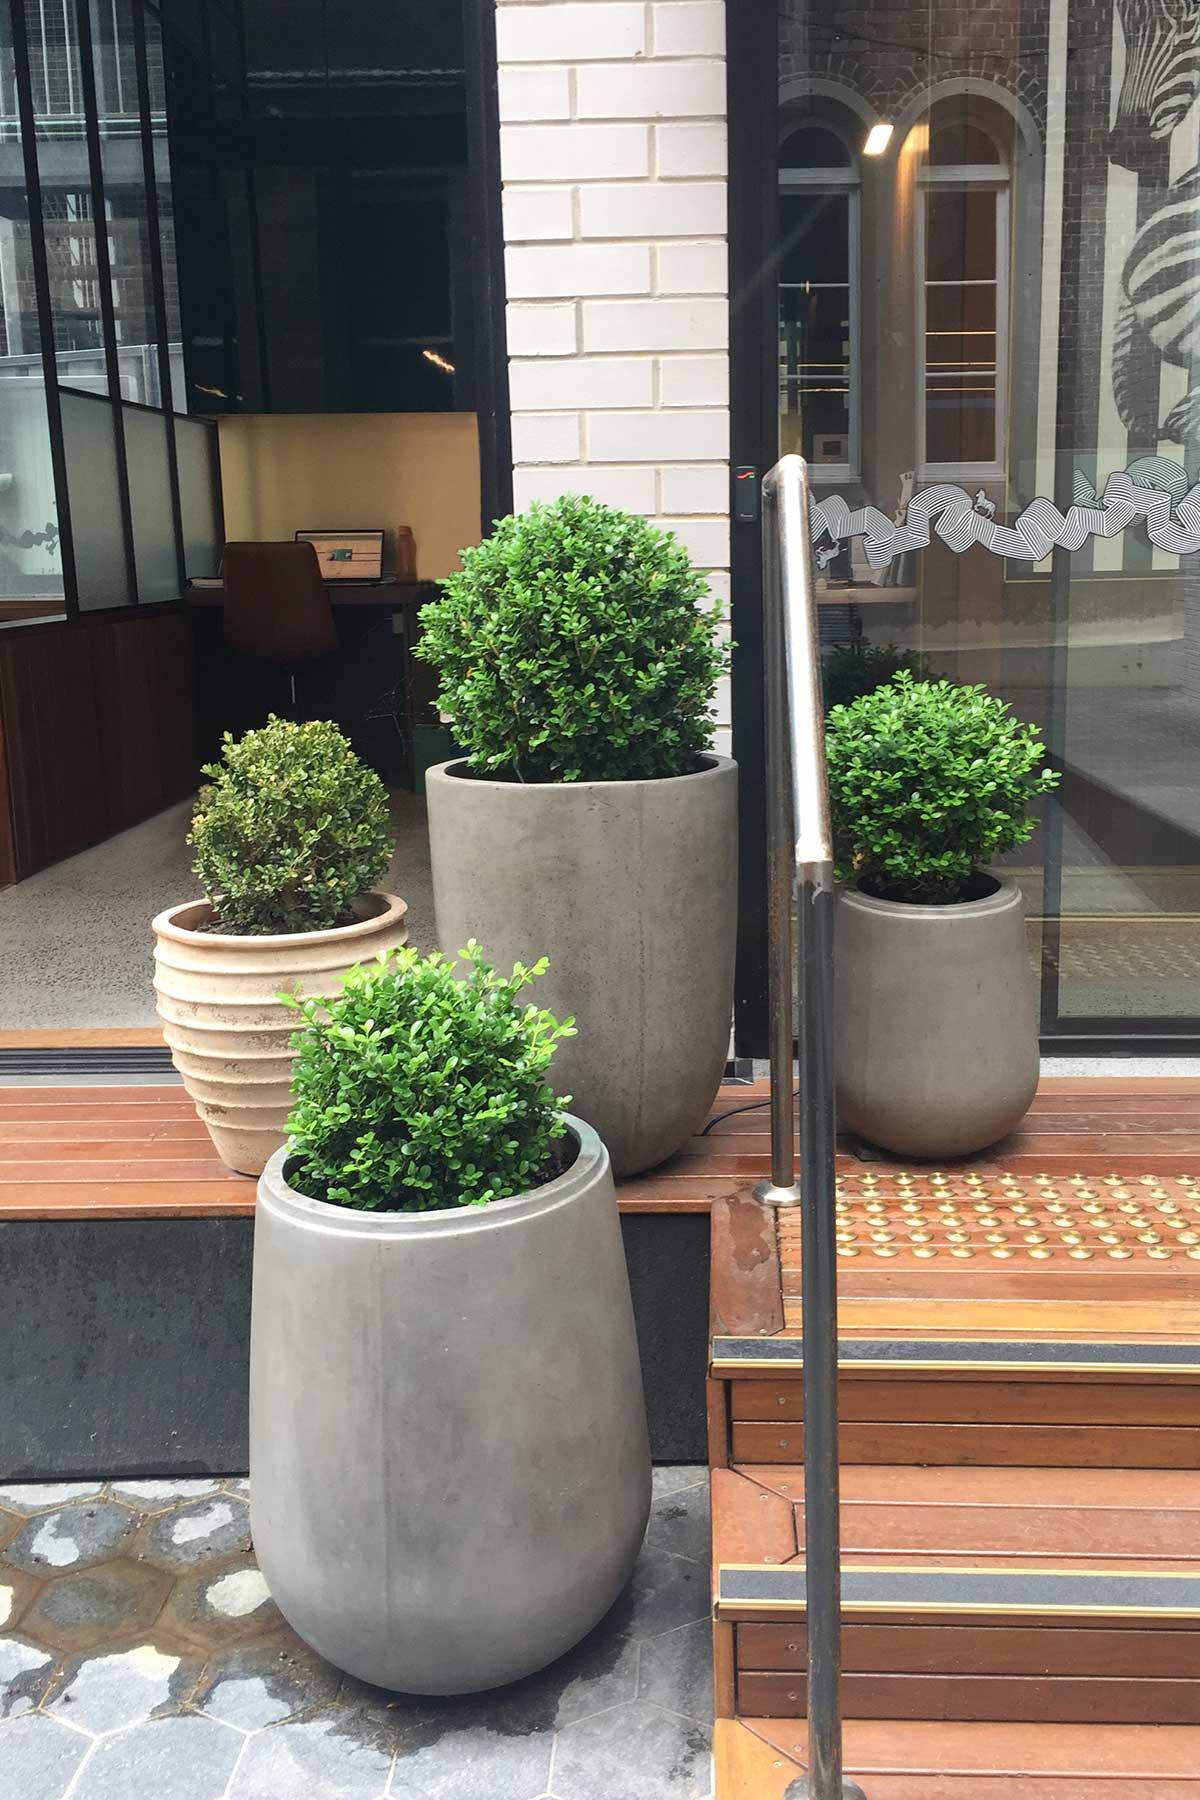 Featuring the 'Gavitella' pot by Moderno ARD, a collaboration between Adam Robinson Design and Garden Life.